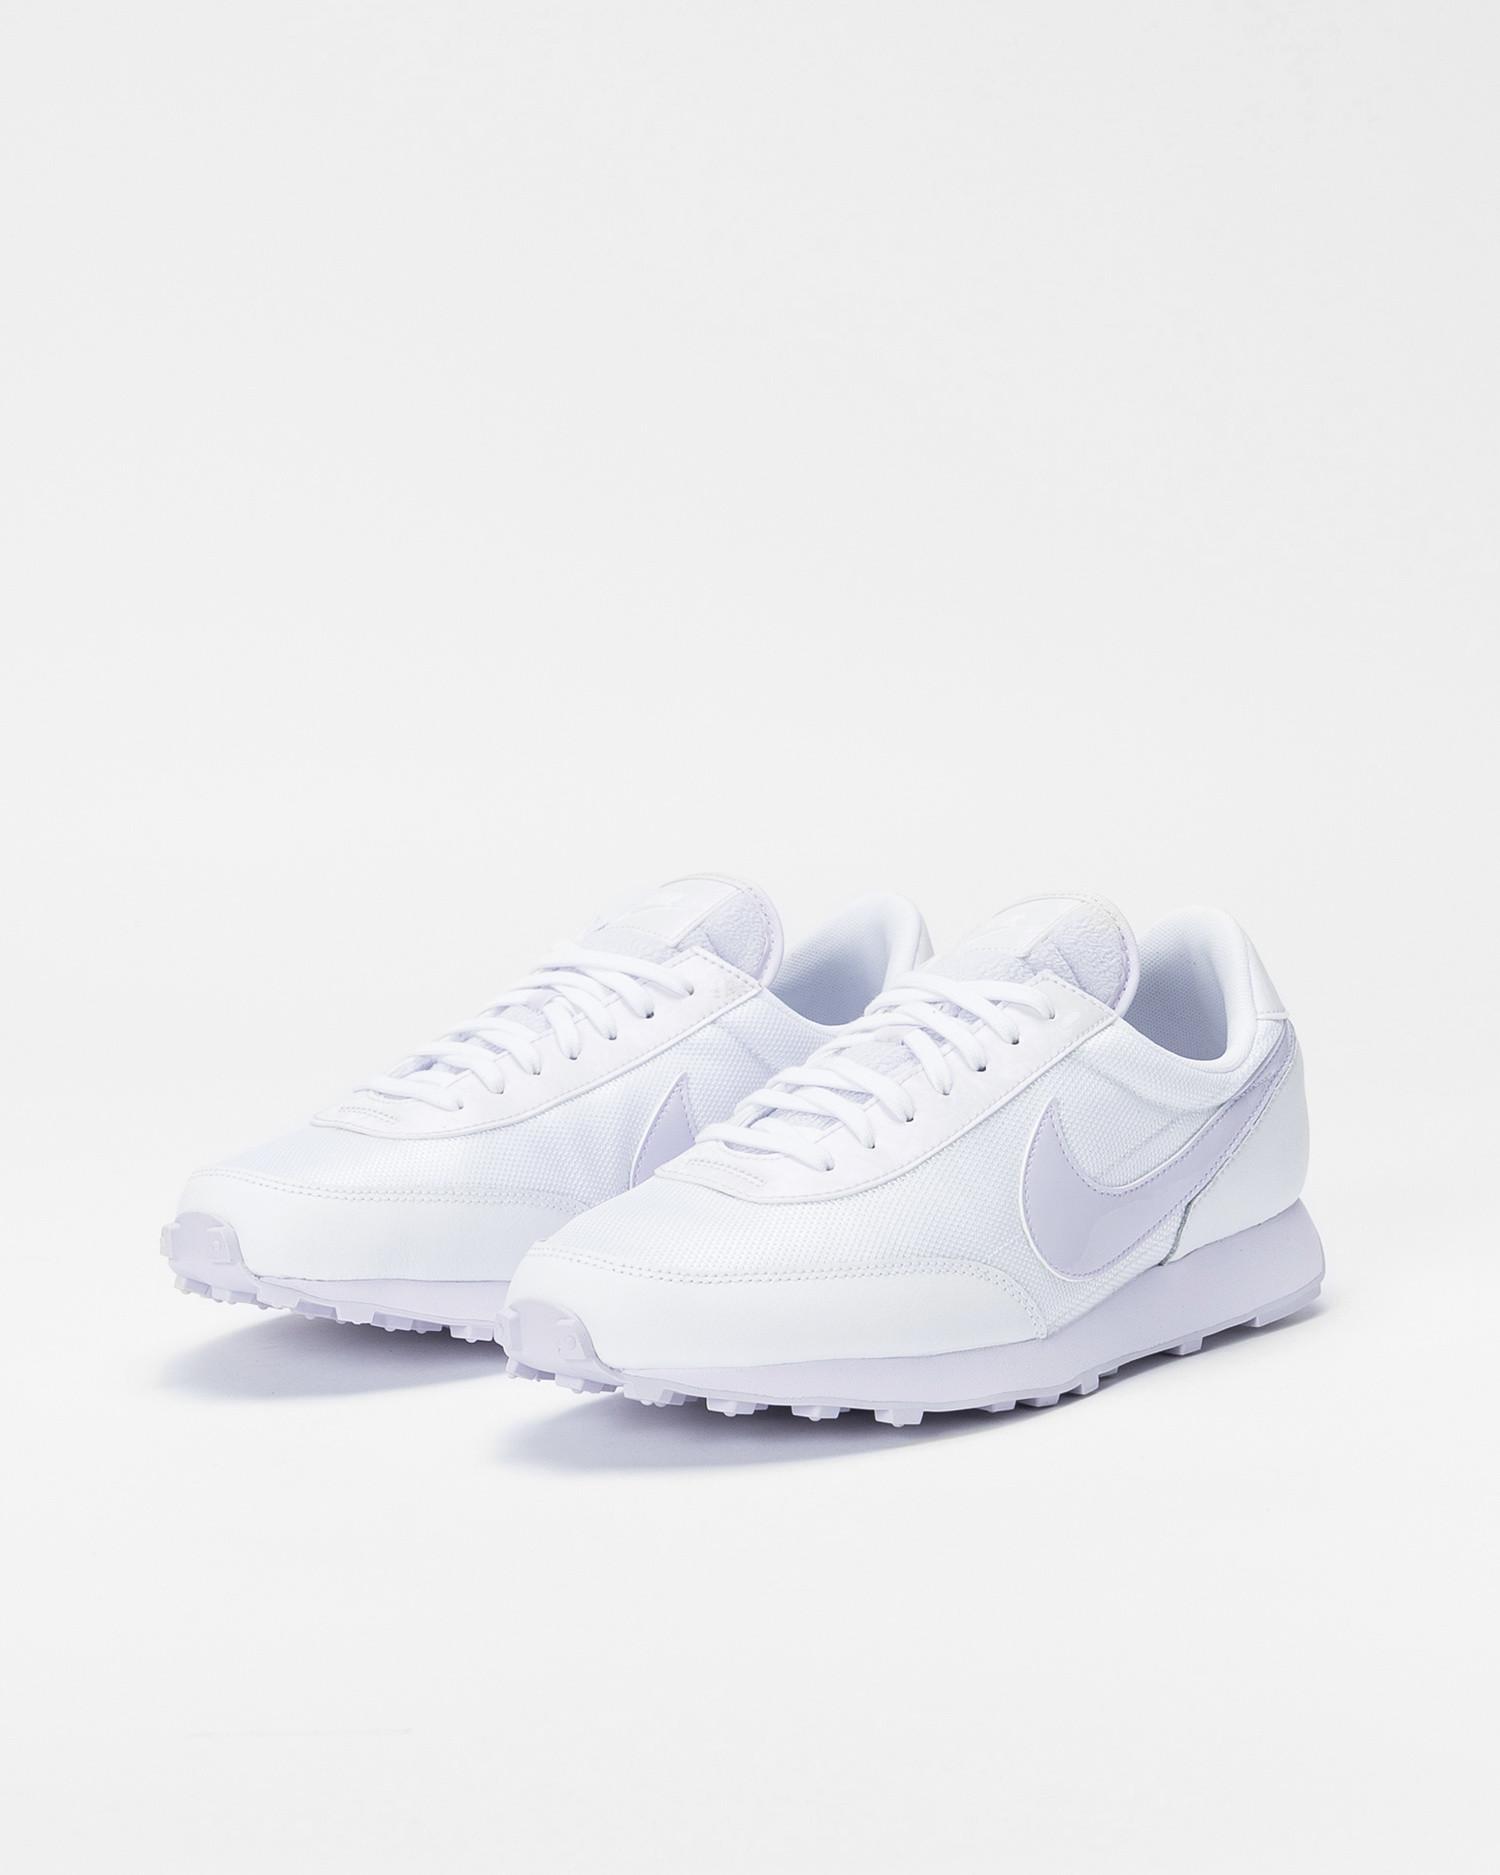 Nike Wmns Daybreak White/barely grape